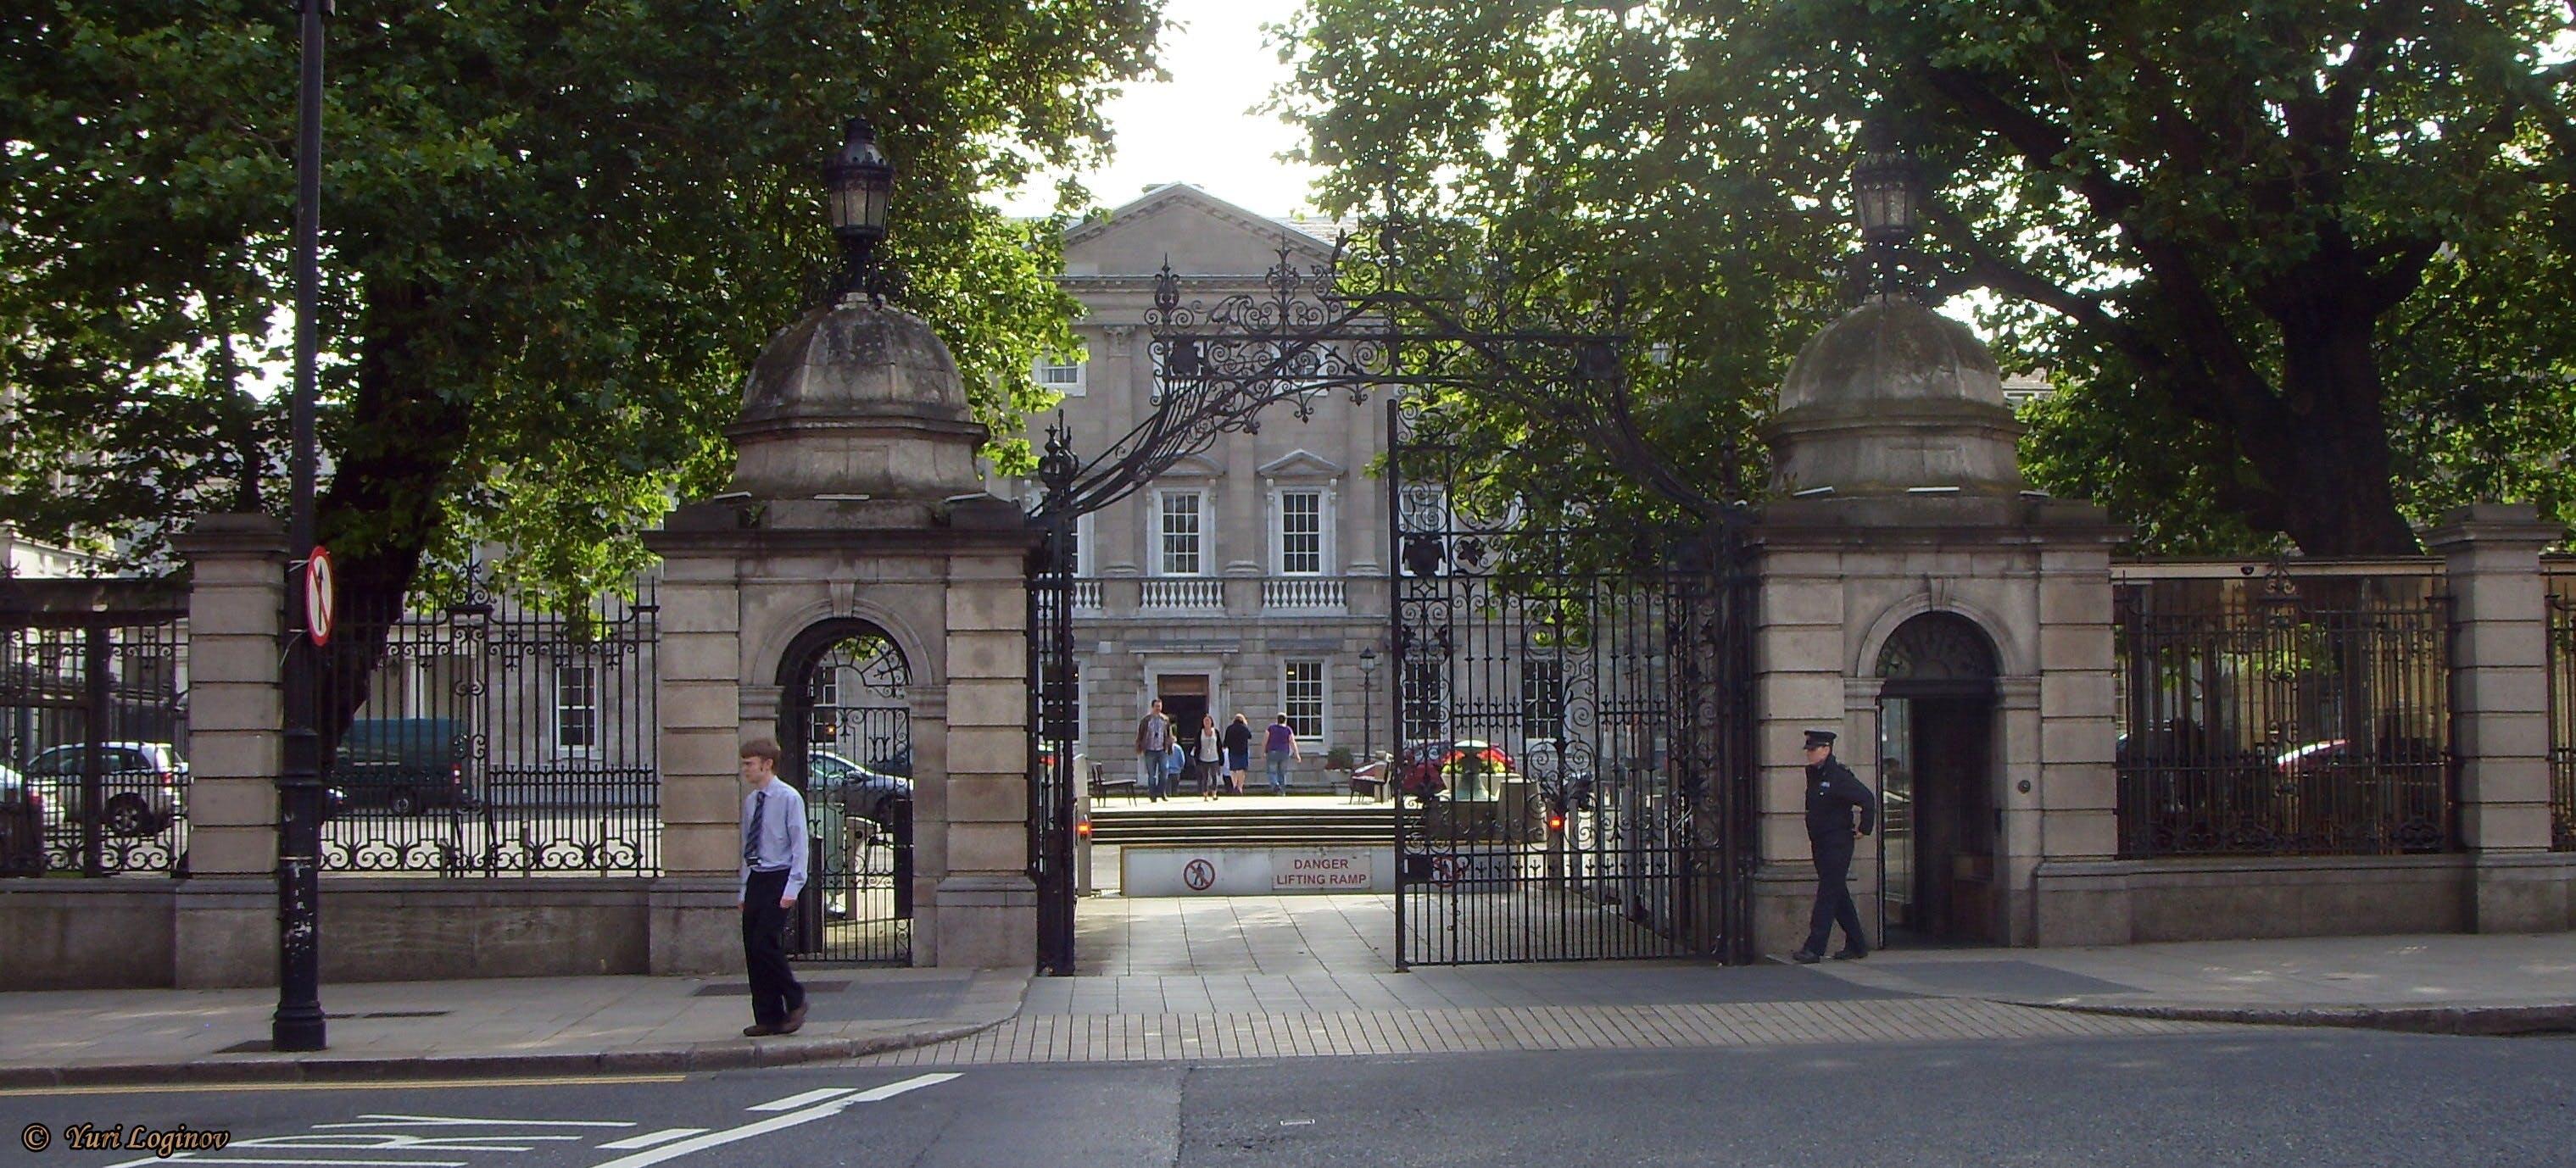 Free stock photo of dublin, ireland, Leinster House